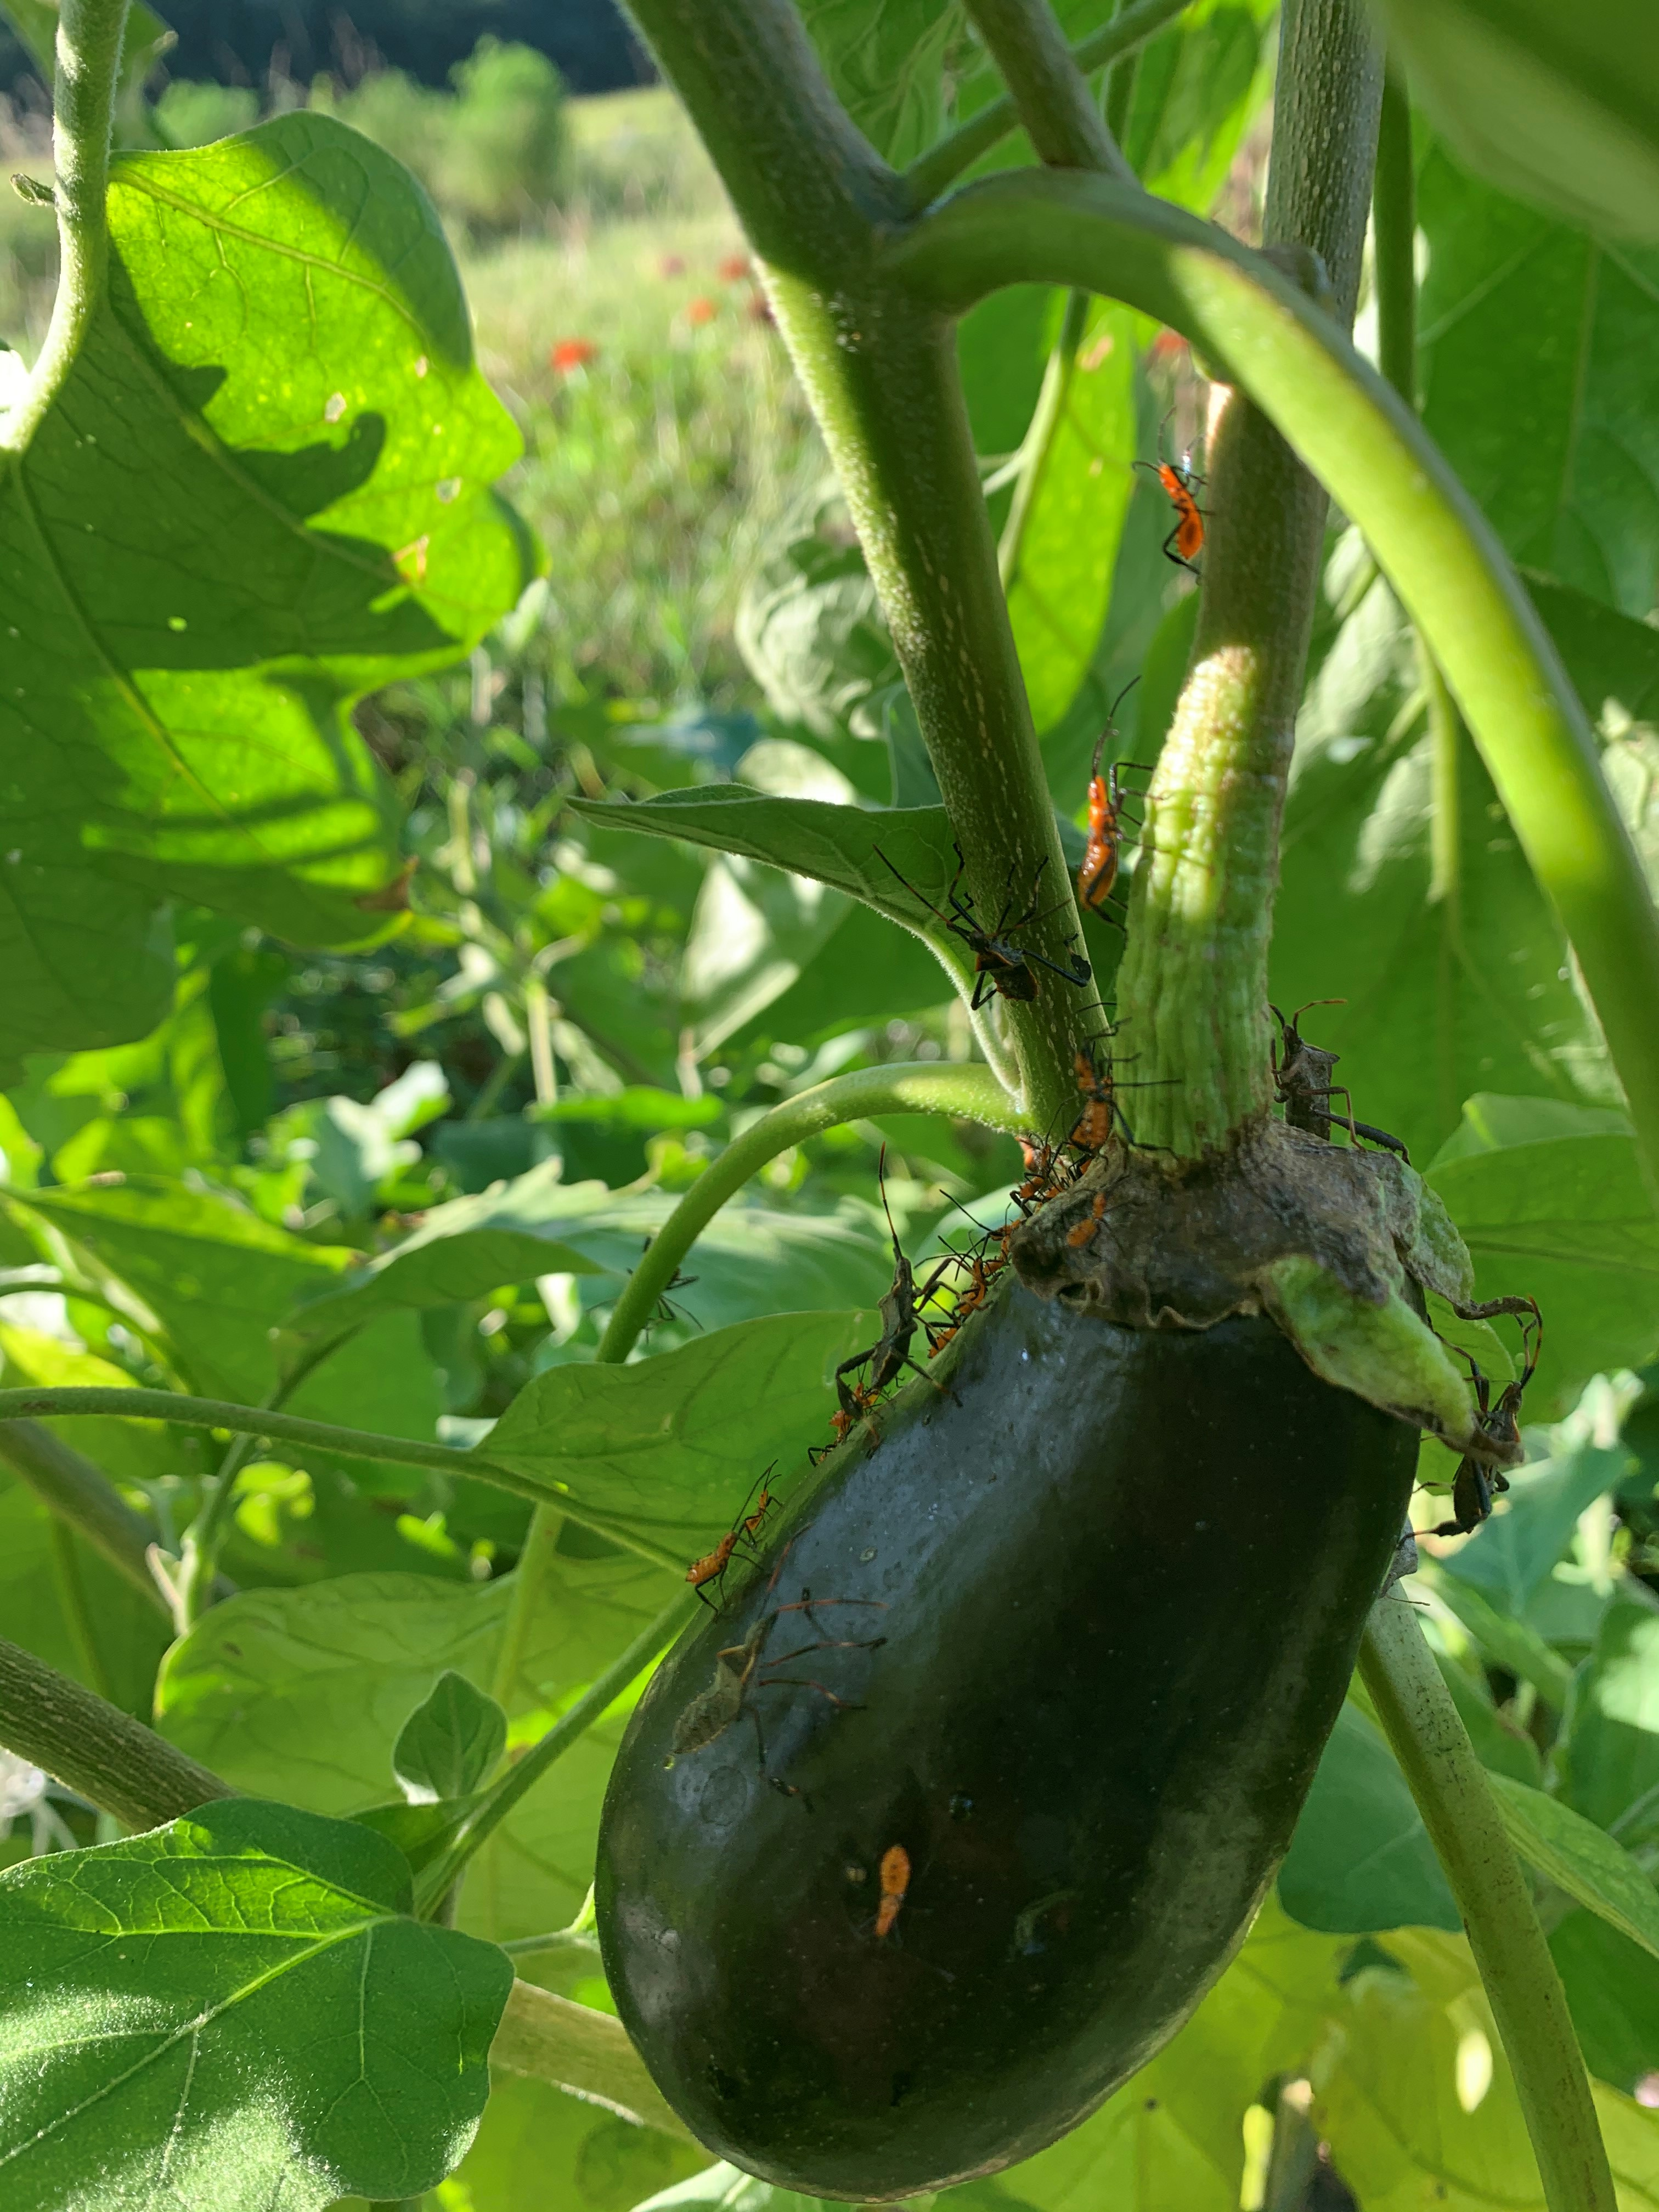 leaffooted bug on eggplant